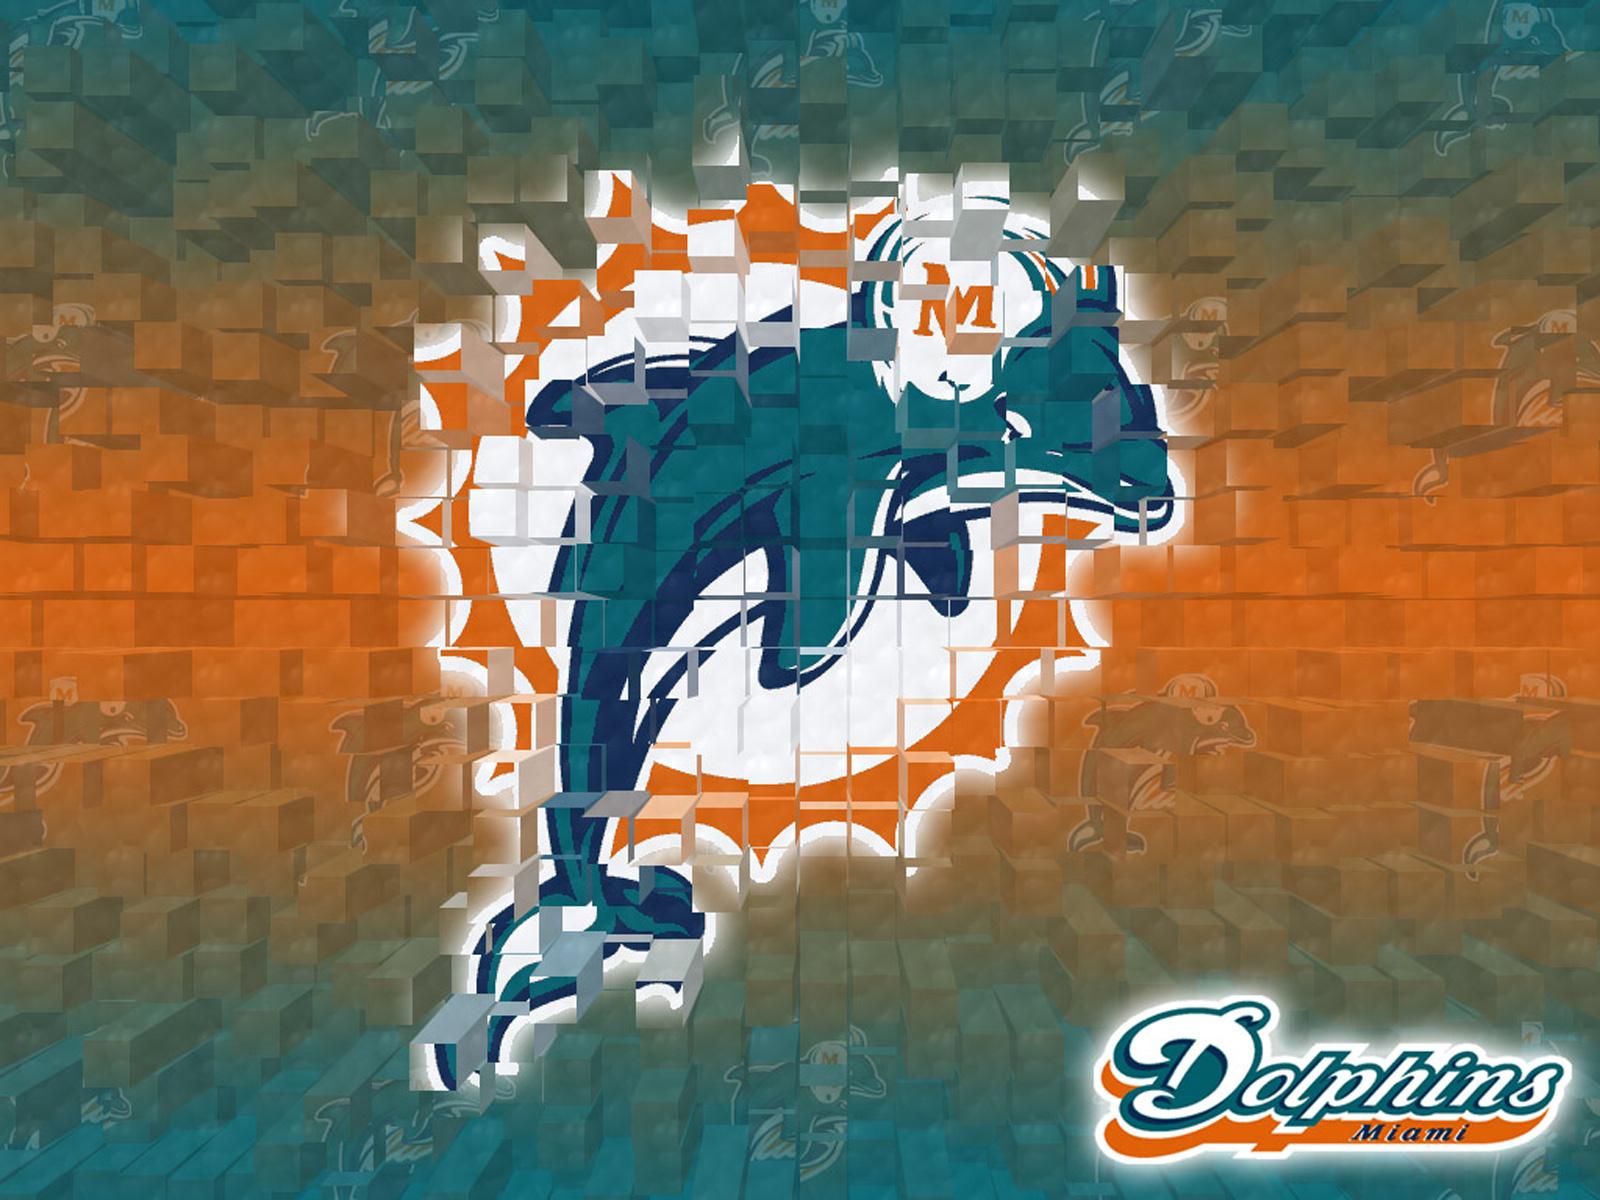 Miami Dolphins Logo HD dekstop wallpapers   Miami Dolphins Logo 1600x1200